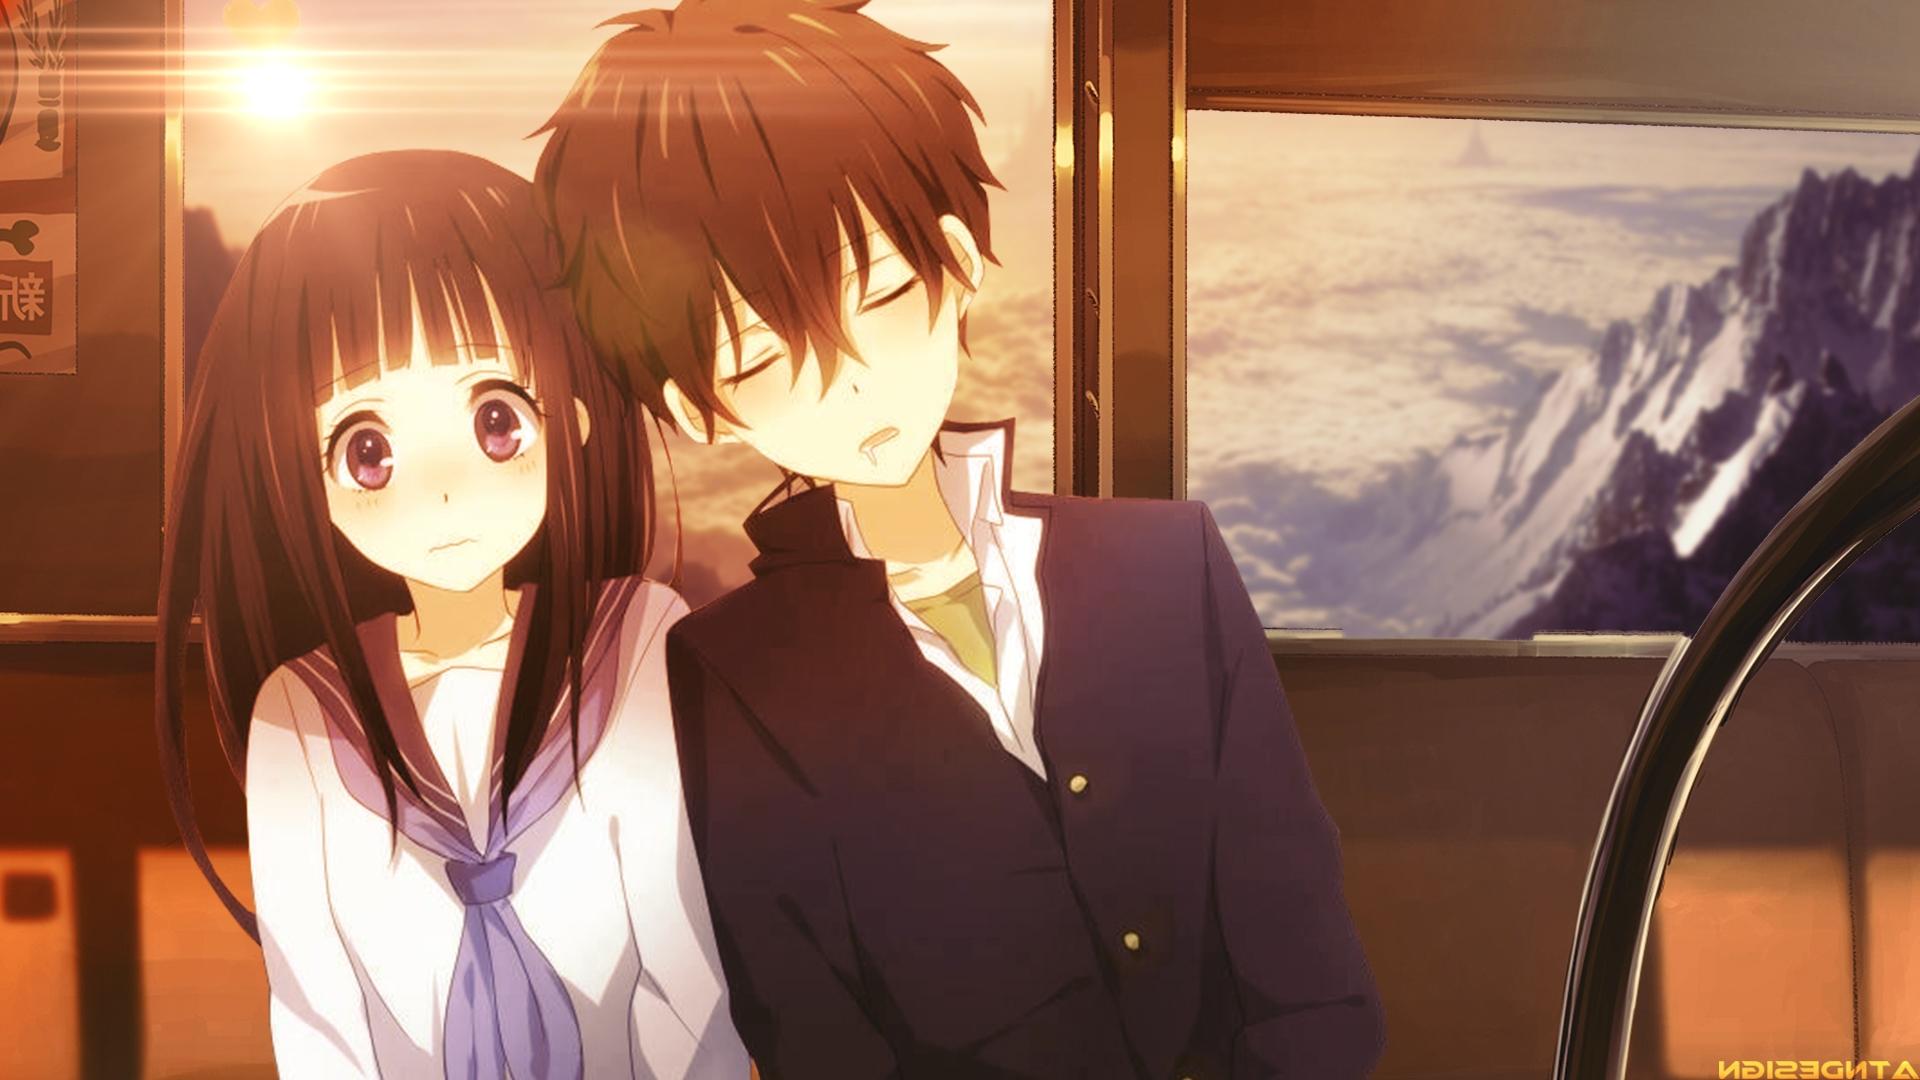 Cute Anime Couple Wallpaper Cute Anime Couple Wallpaper จ ท น